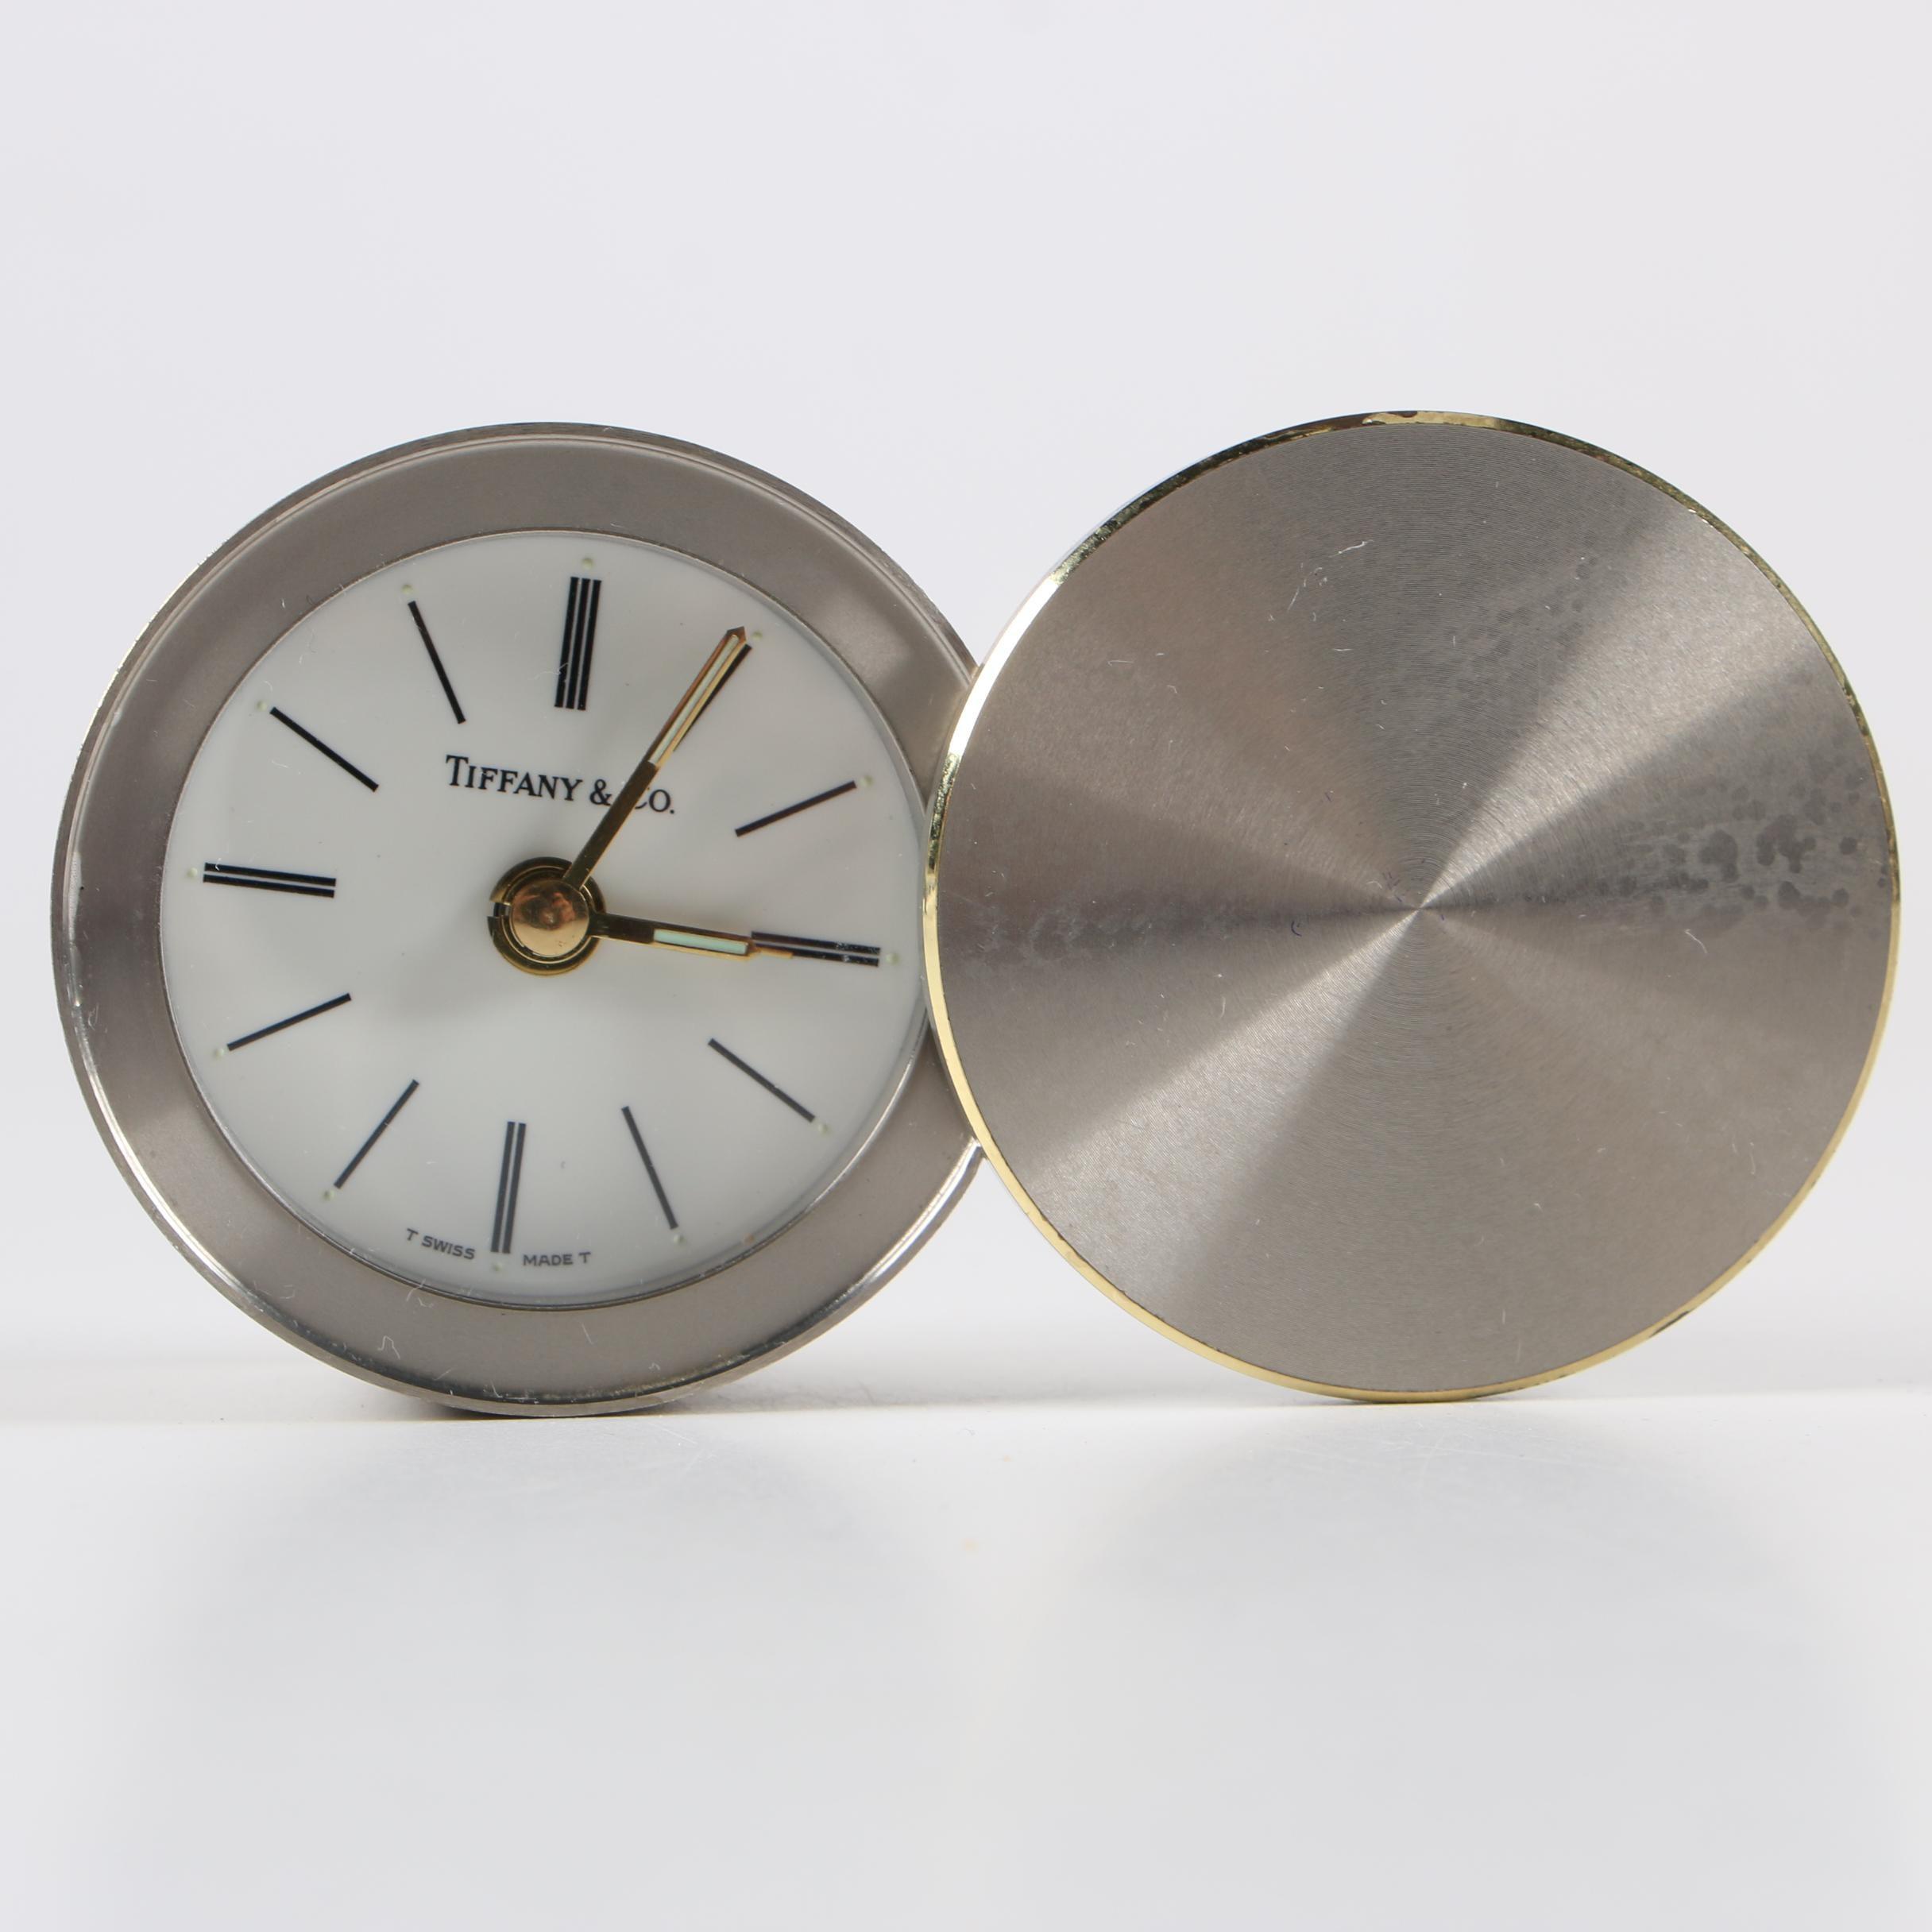 Tiffany & Co. Swiss Travel Alarm Clock